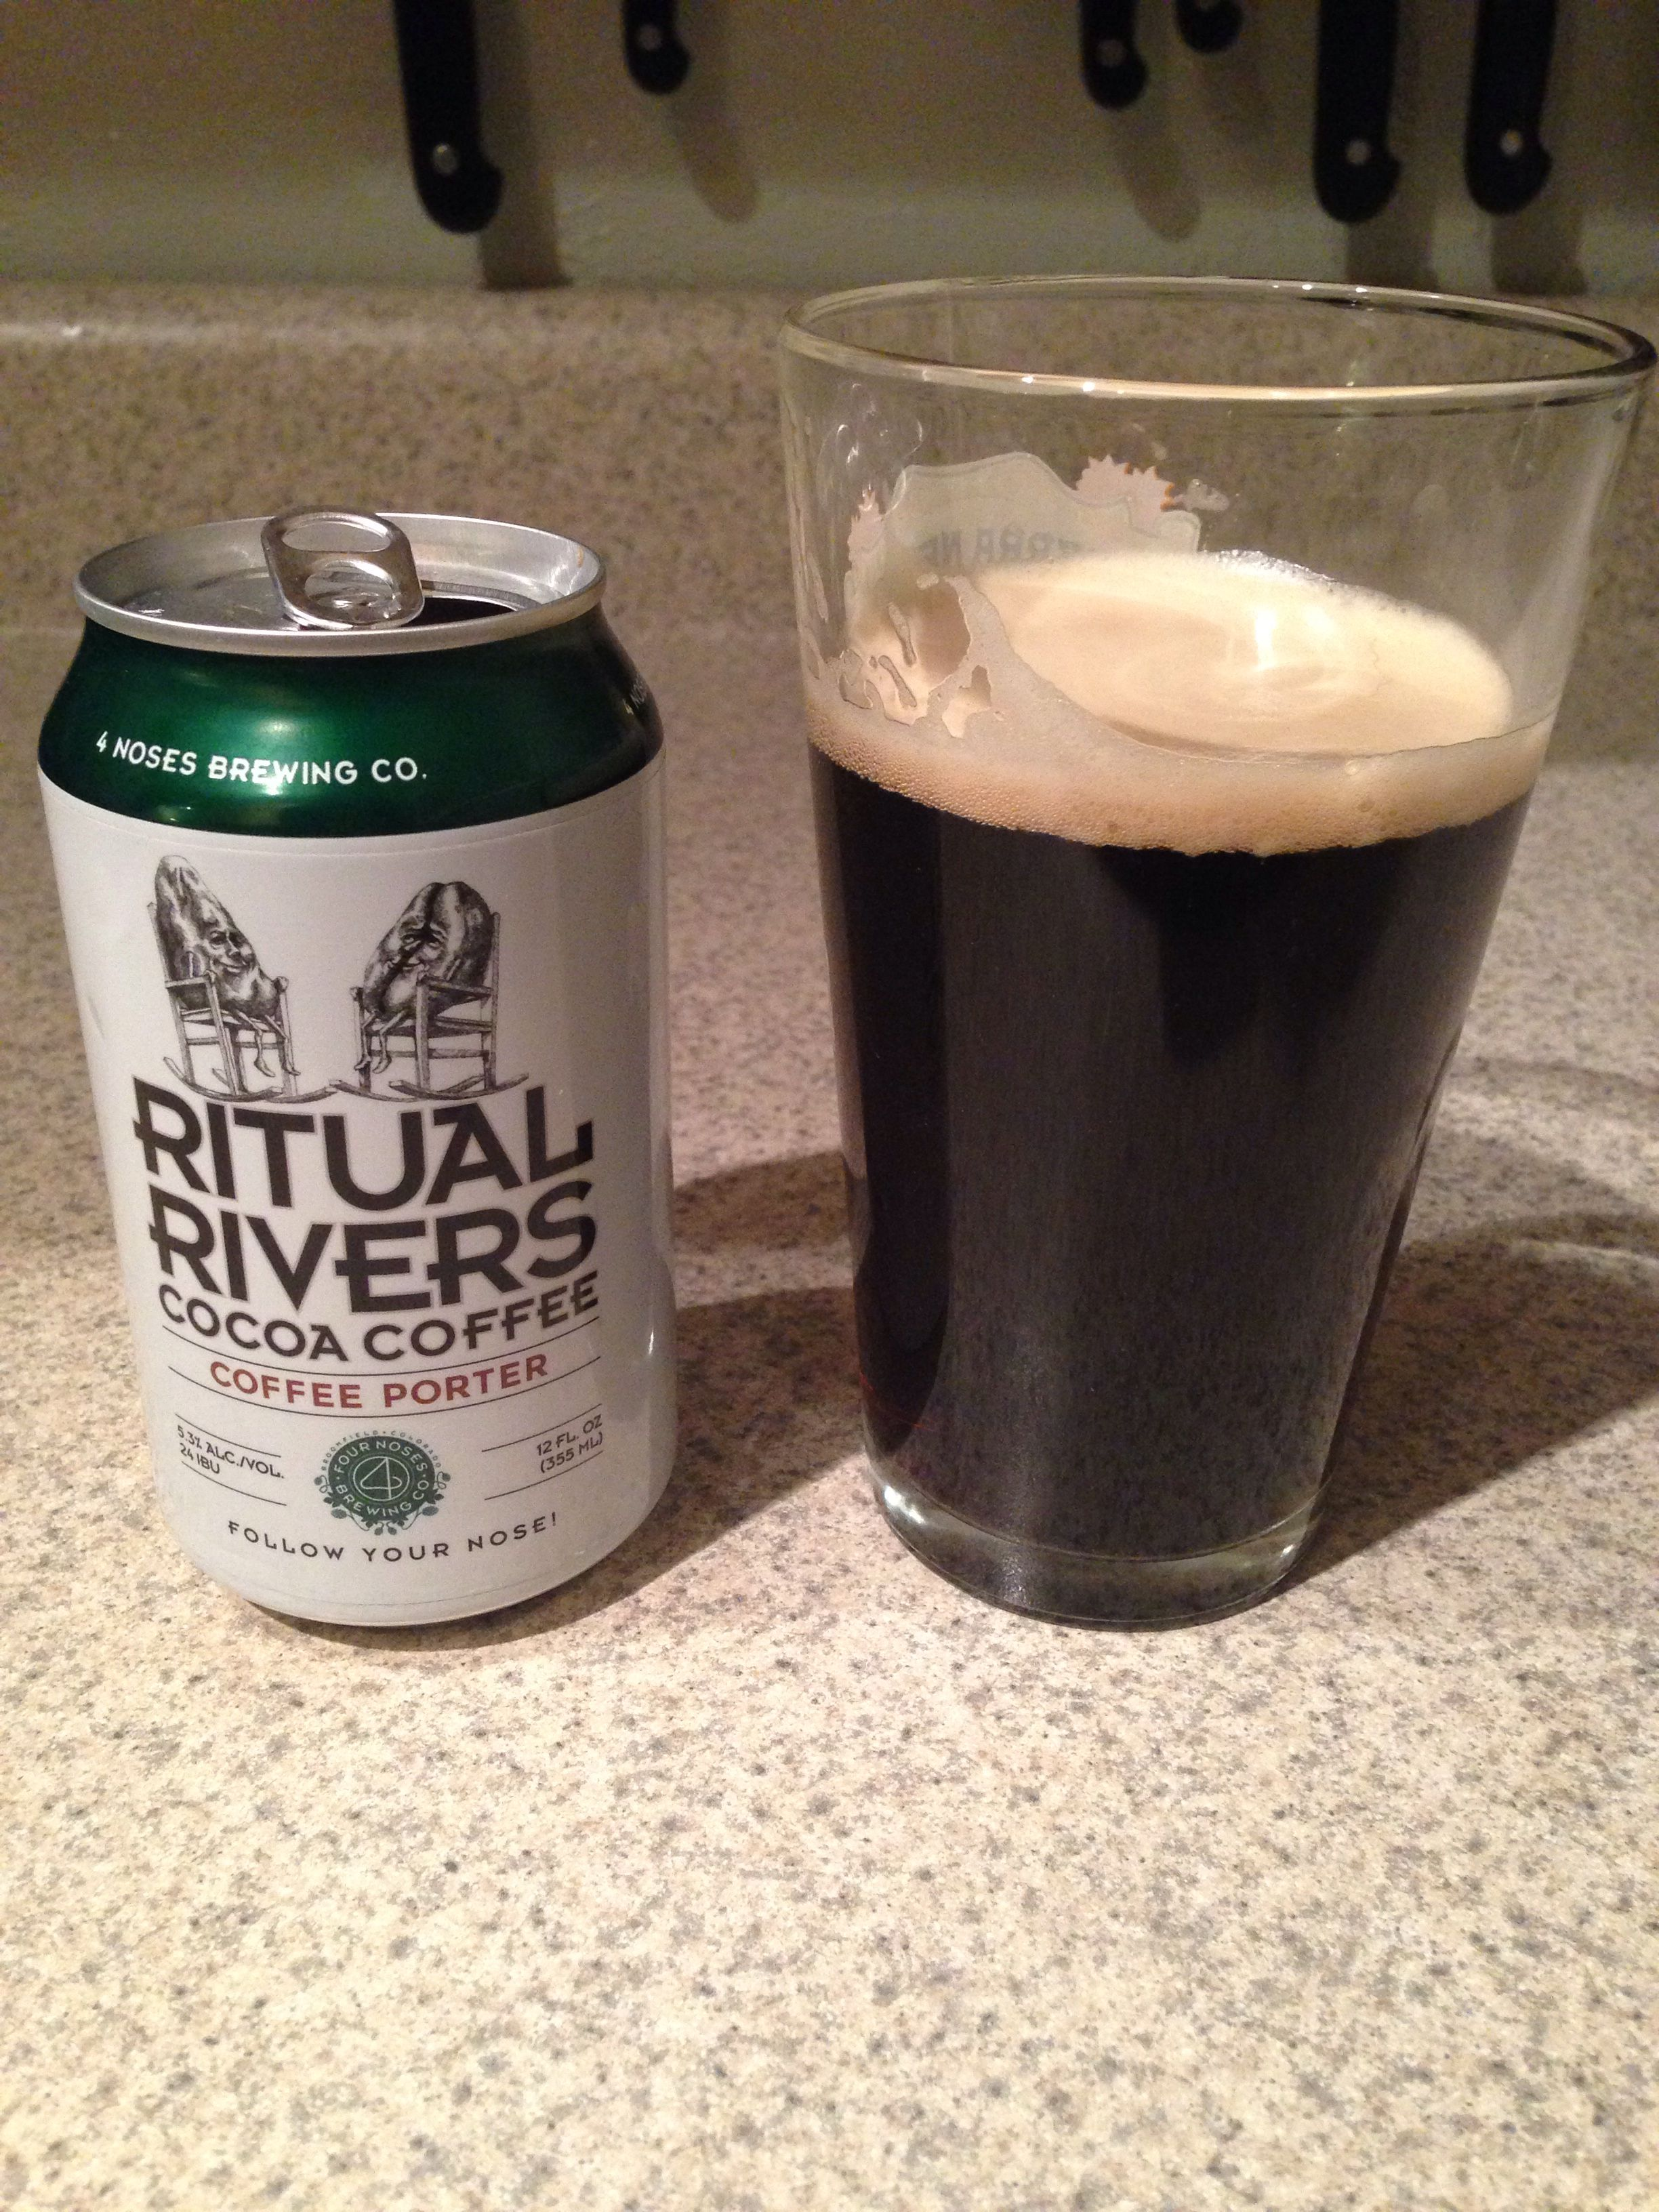 4 Noses Brewing Ritual Rivers Cocoa Coffee Porter